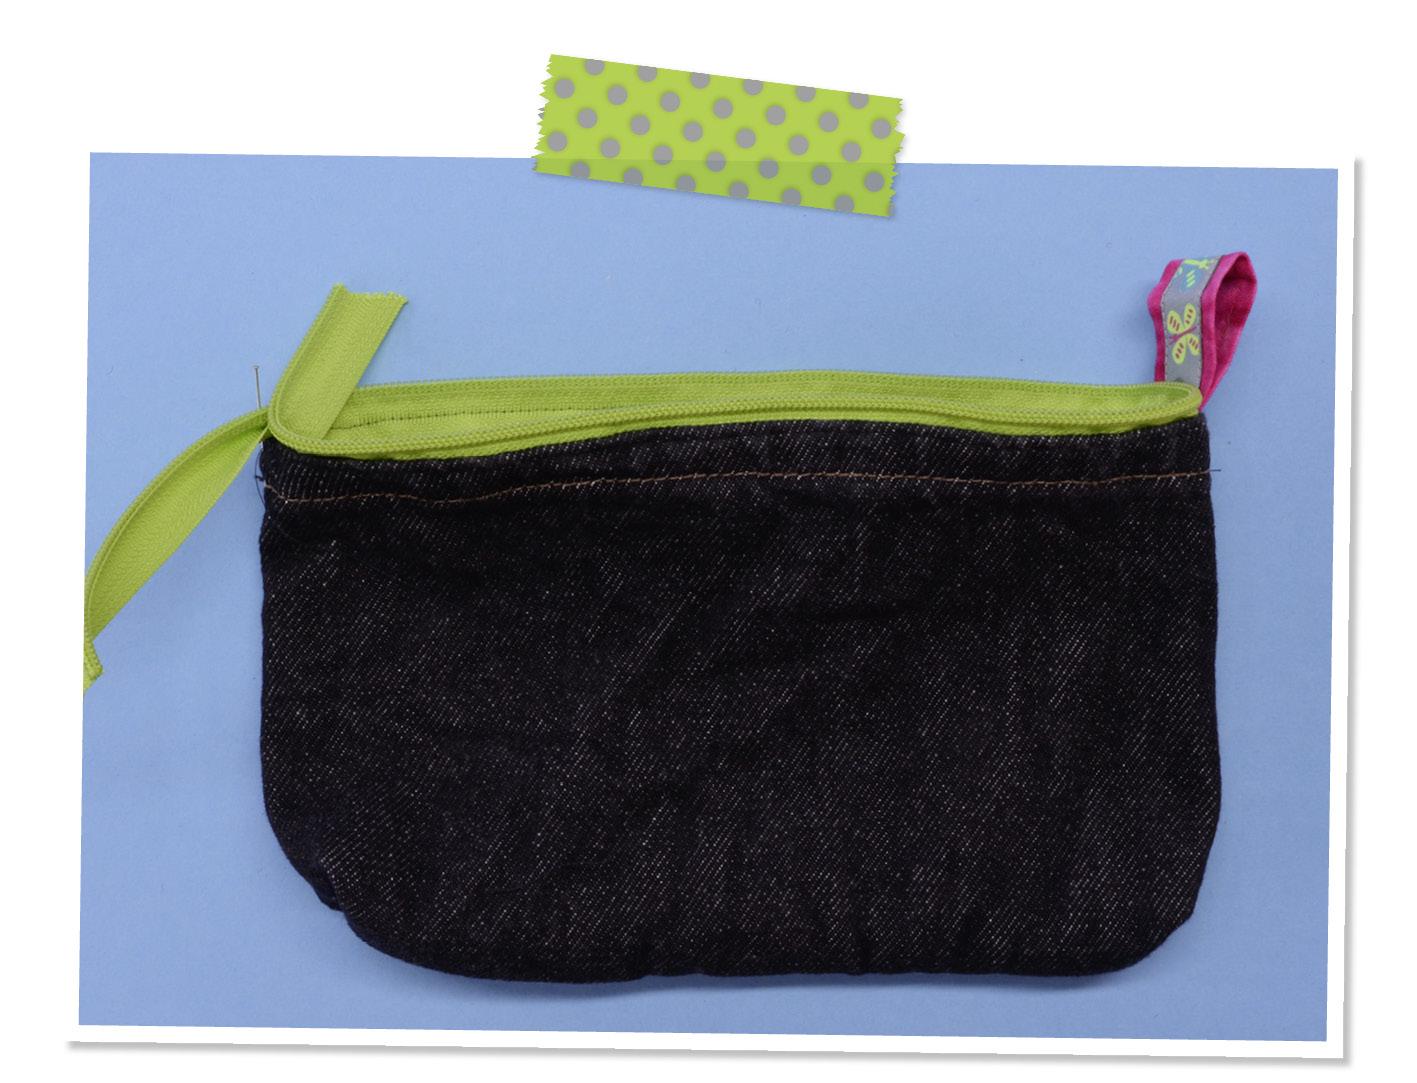 Mäppchen, Tasche, Jeans Recycling, Nähanleitung Gratis, kostenlos, Upcycling, Nähzimmer, Nähkurs